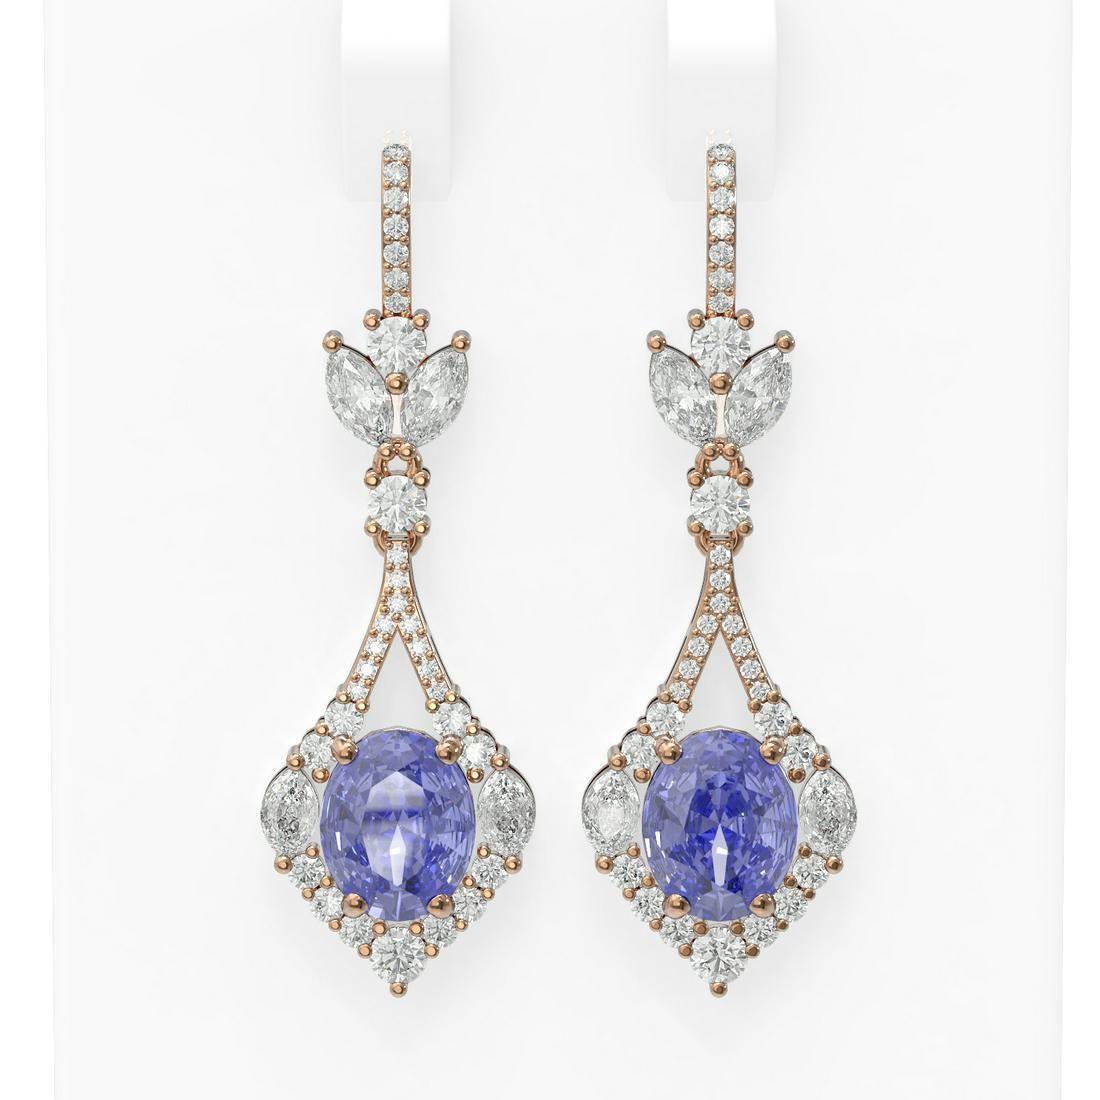 10.73 ctw Tanzanite & Diamond Earrings 18K Rose Gold -